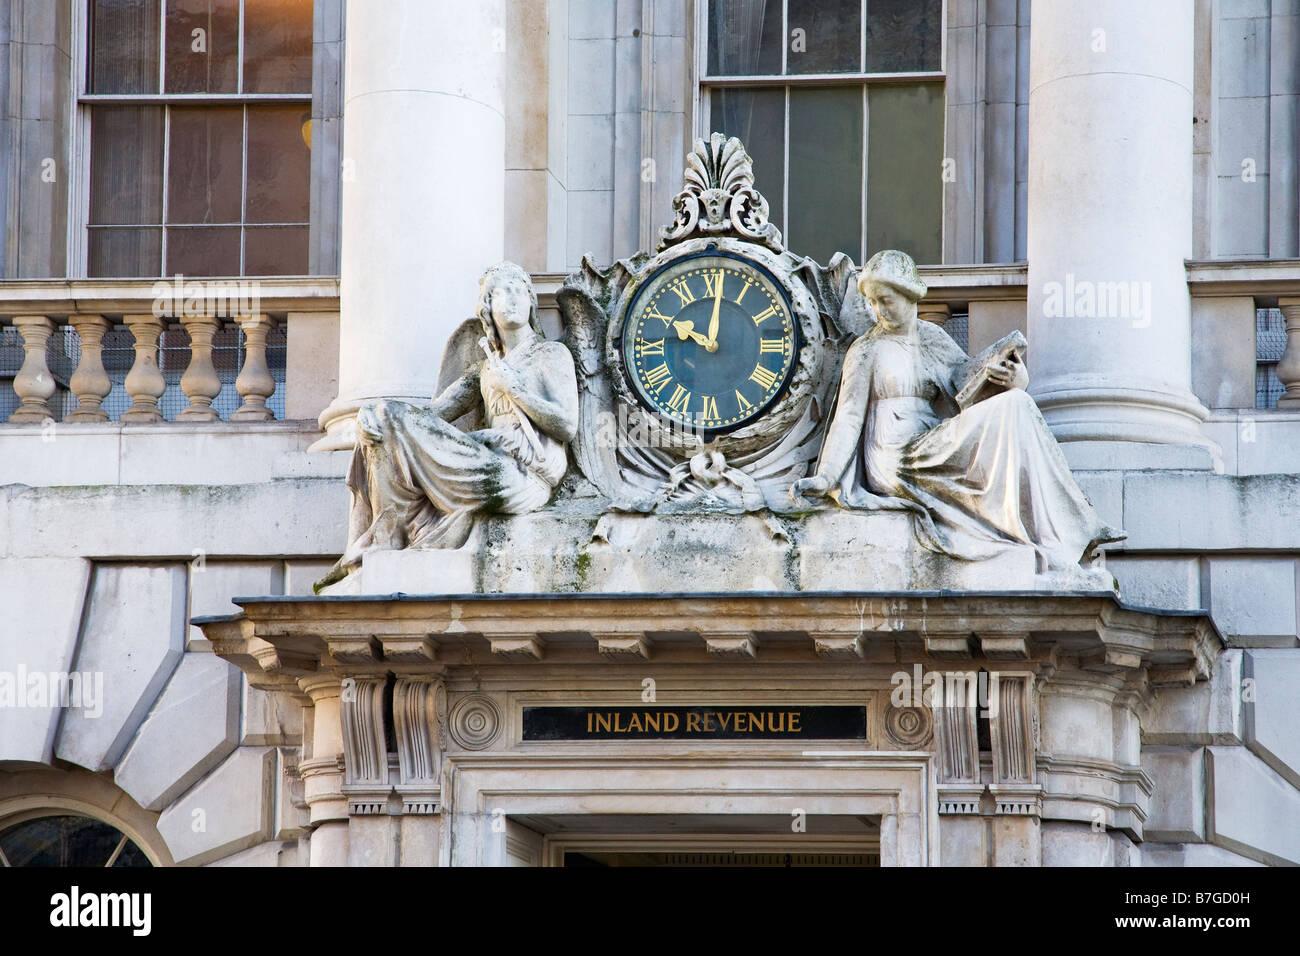 Inland Revenue Office exterior Somerset House London England UK United Kingdom GB Great Britain British Isles Europe - Stock Image